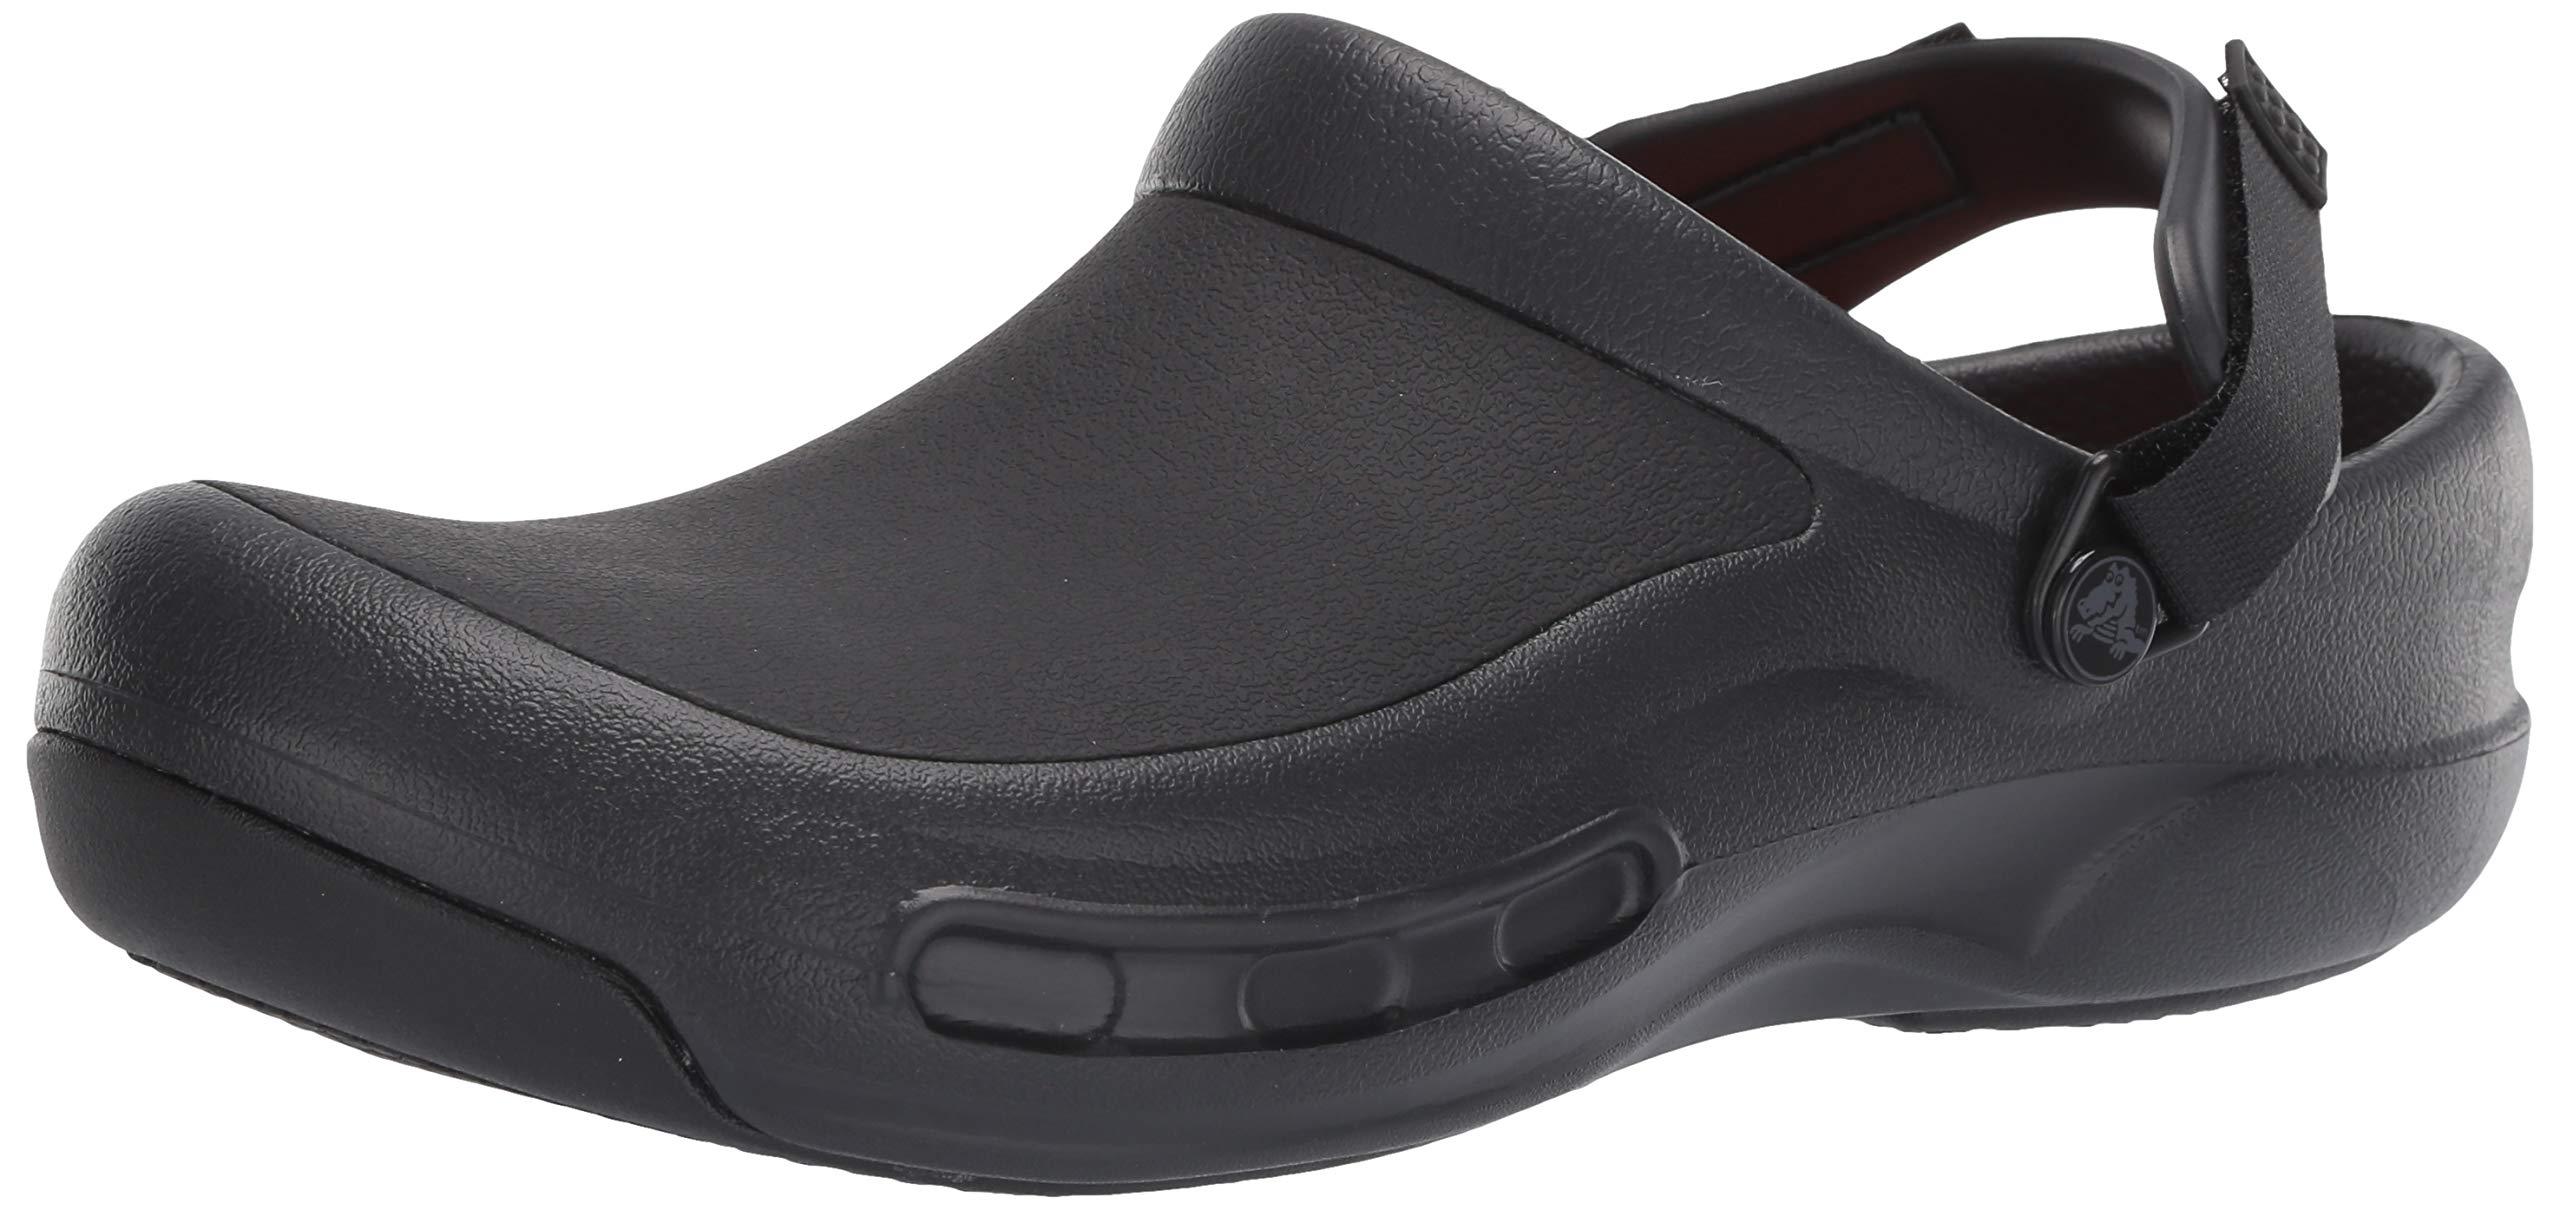 Crocs Bistro Pro LiteRide Clog Black 4